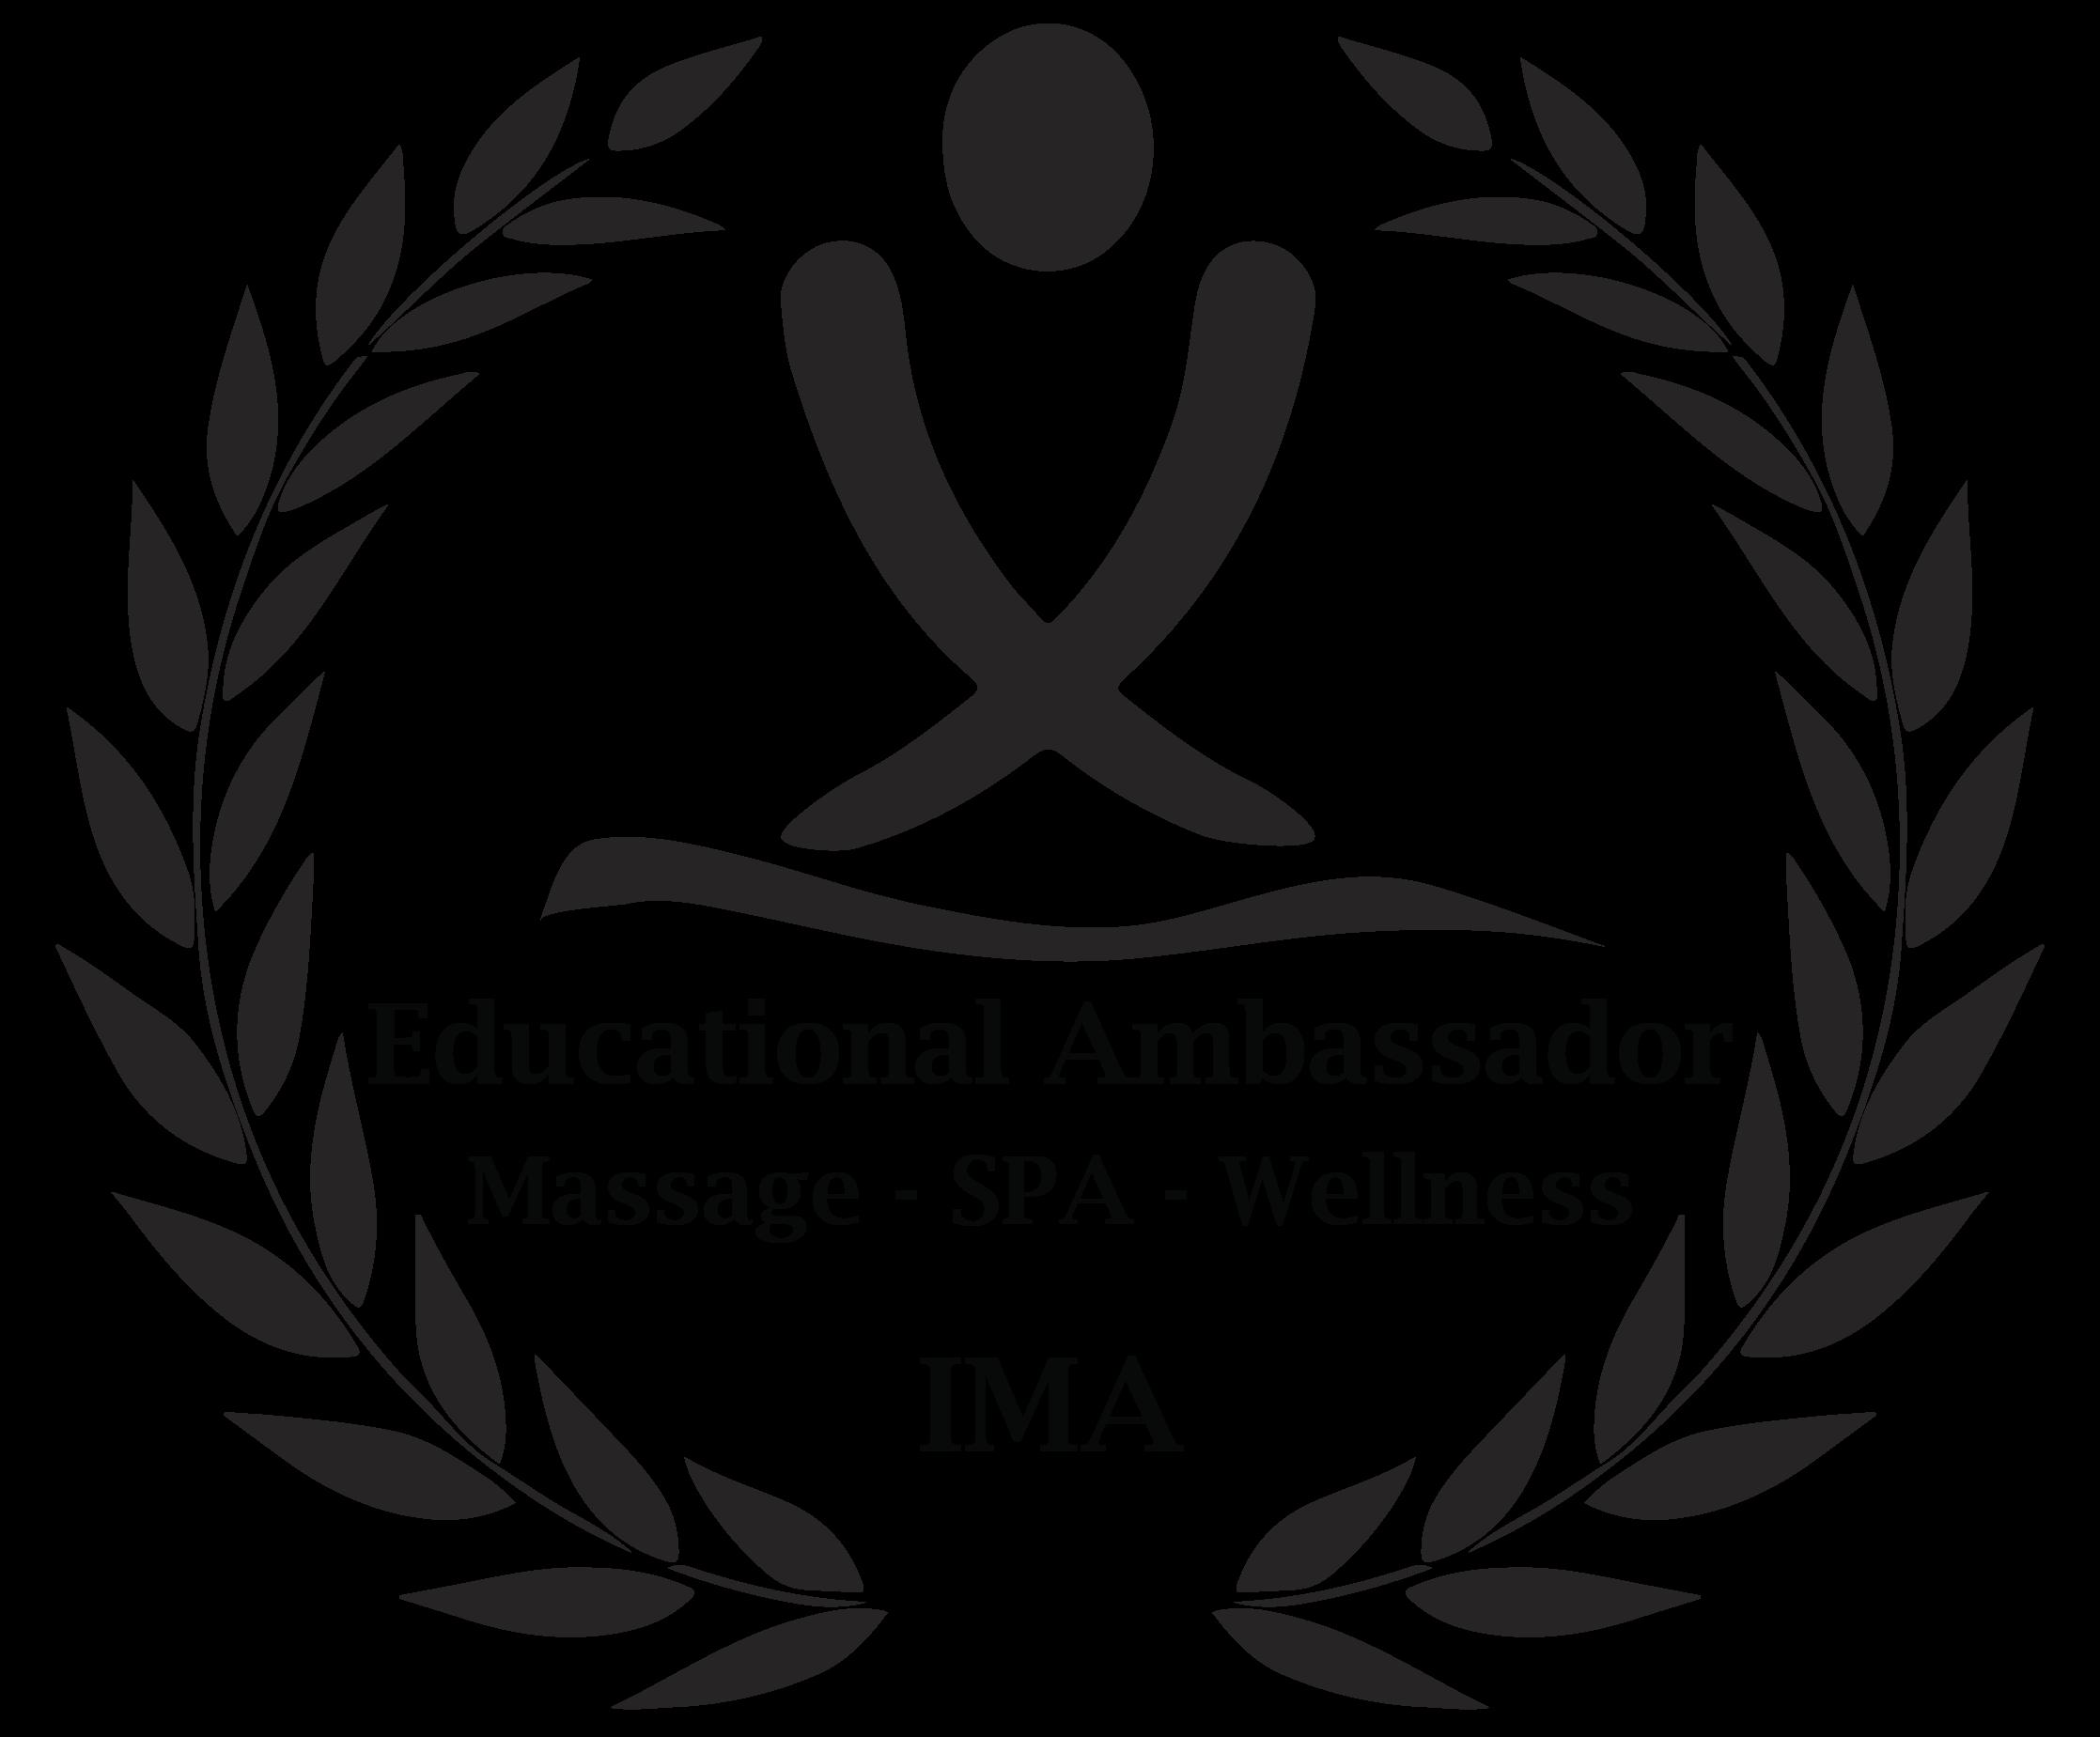 educational ambassador